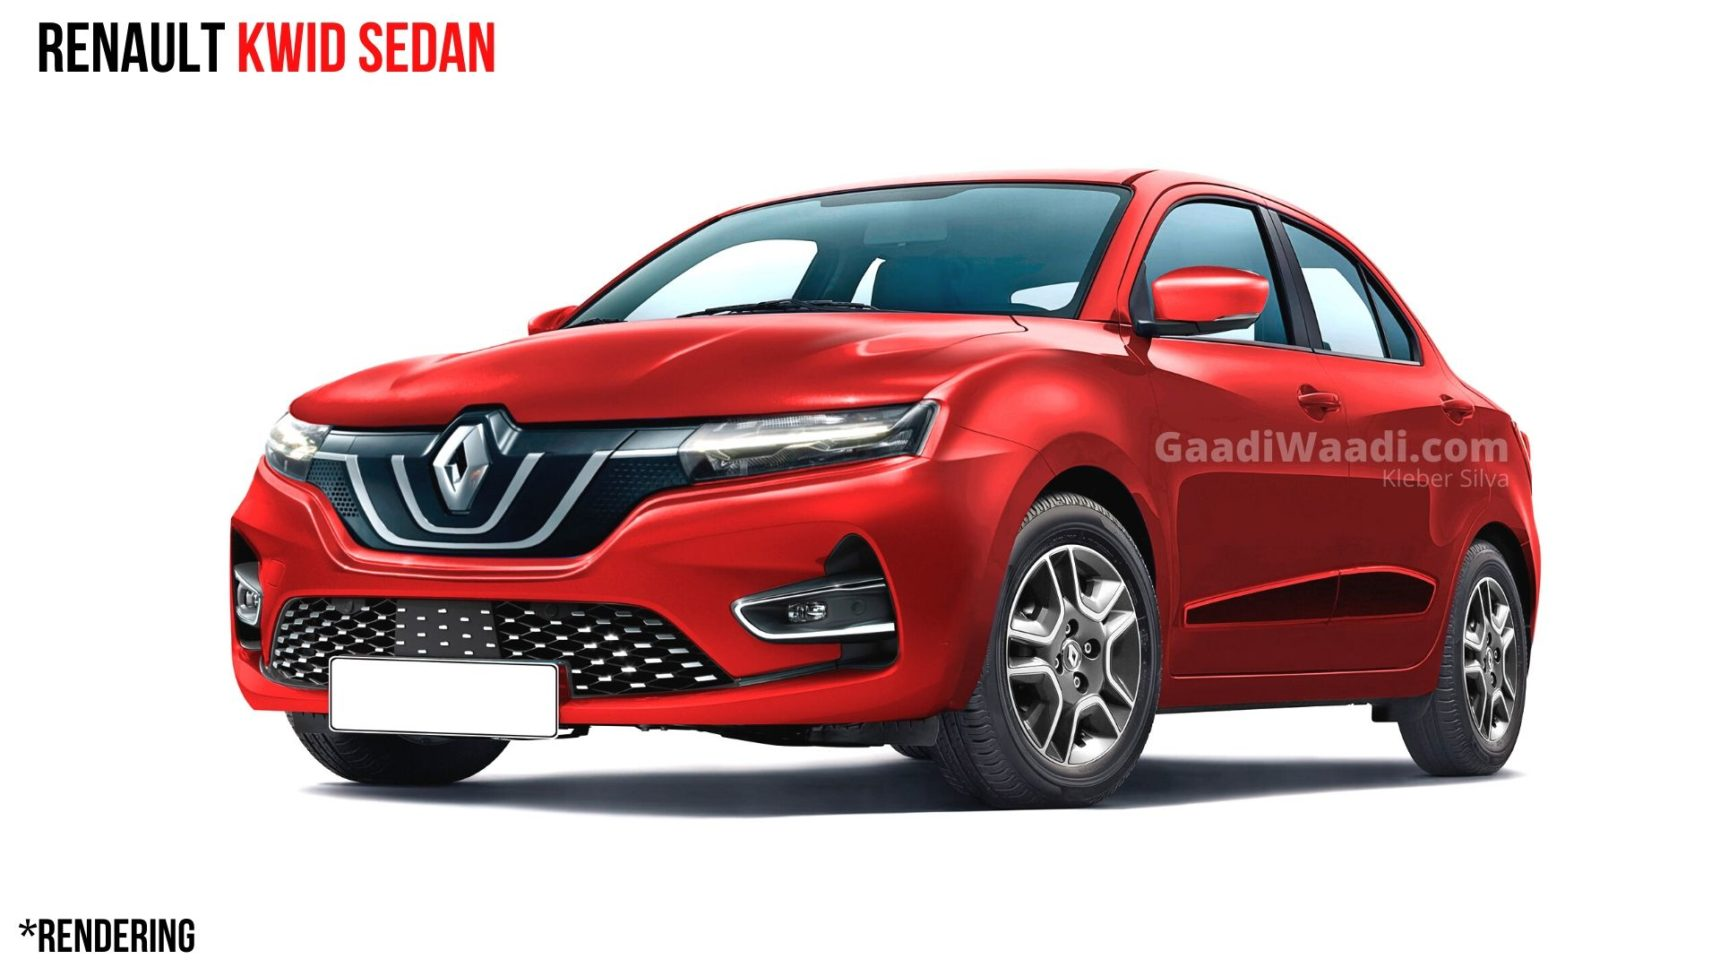 Renault Kwid-based LBA Compact Sedan Launch Expected In 5